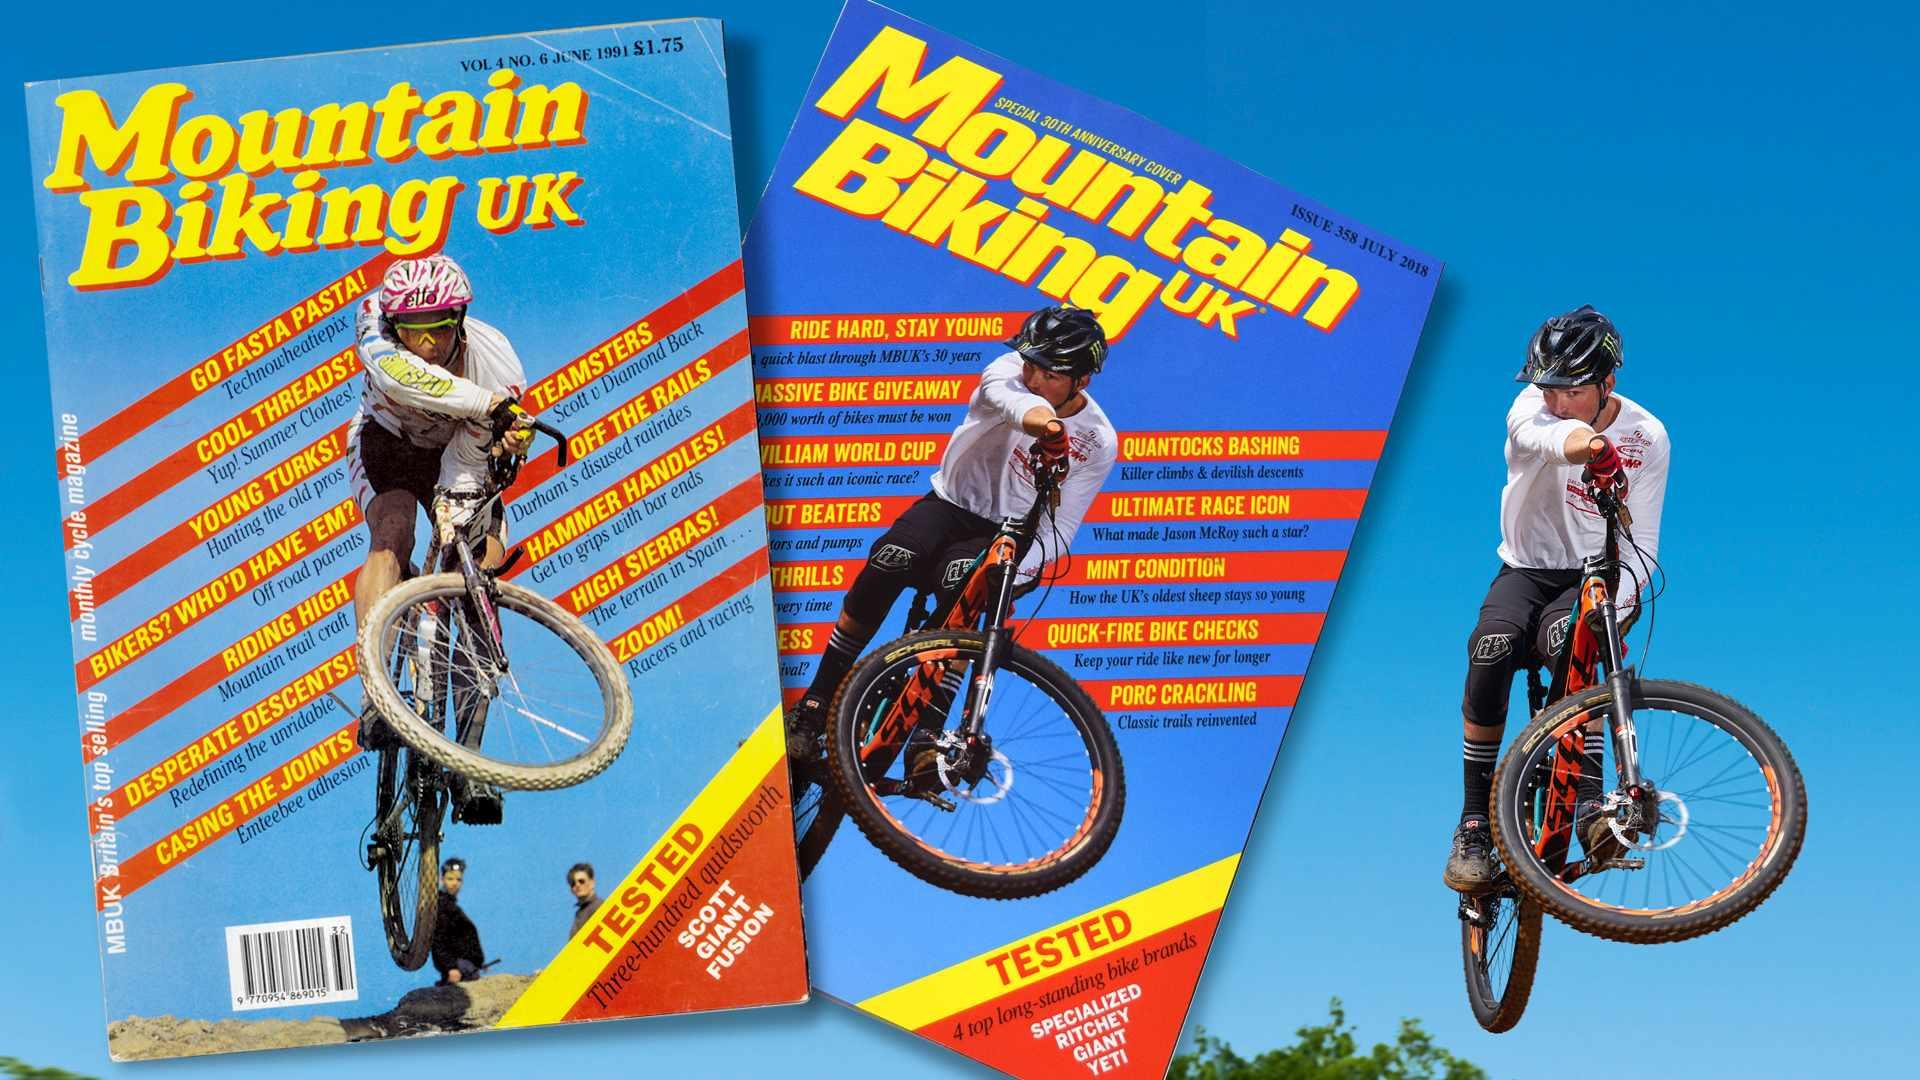 MBUK 30th anniversary cover